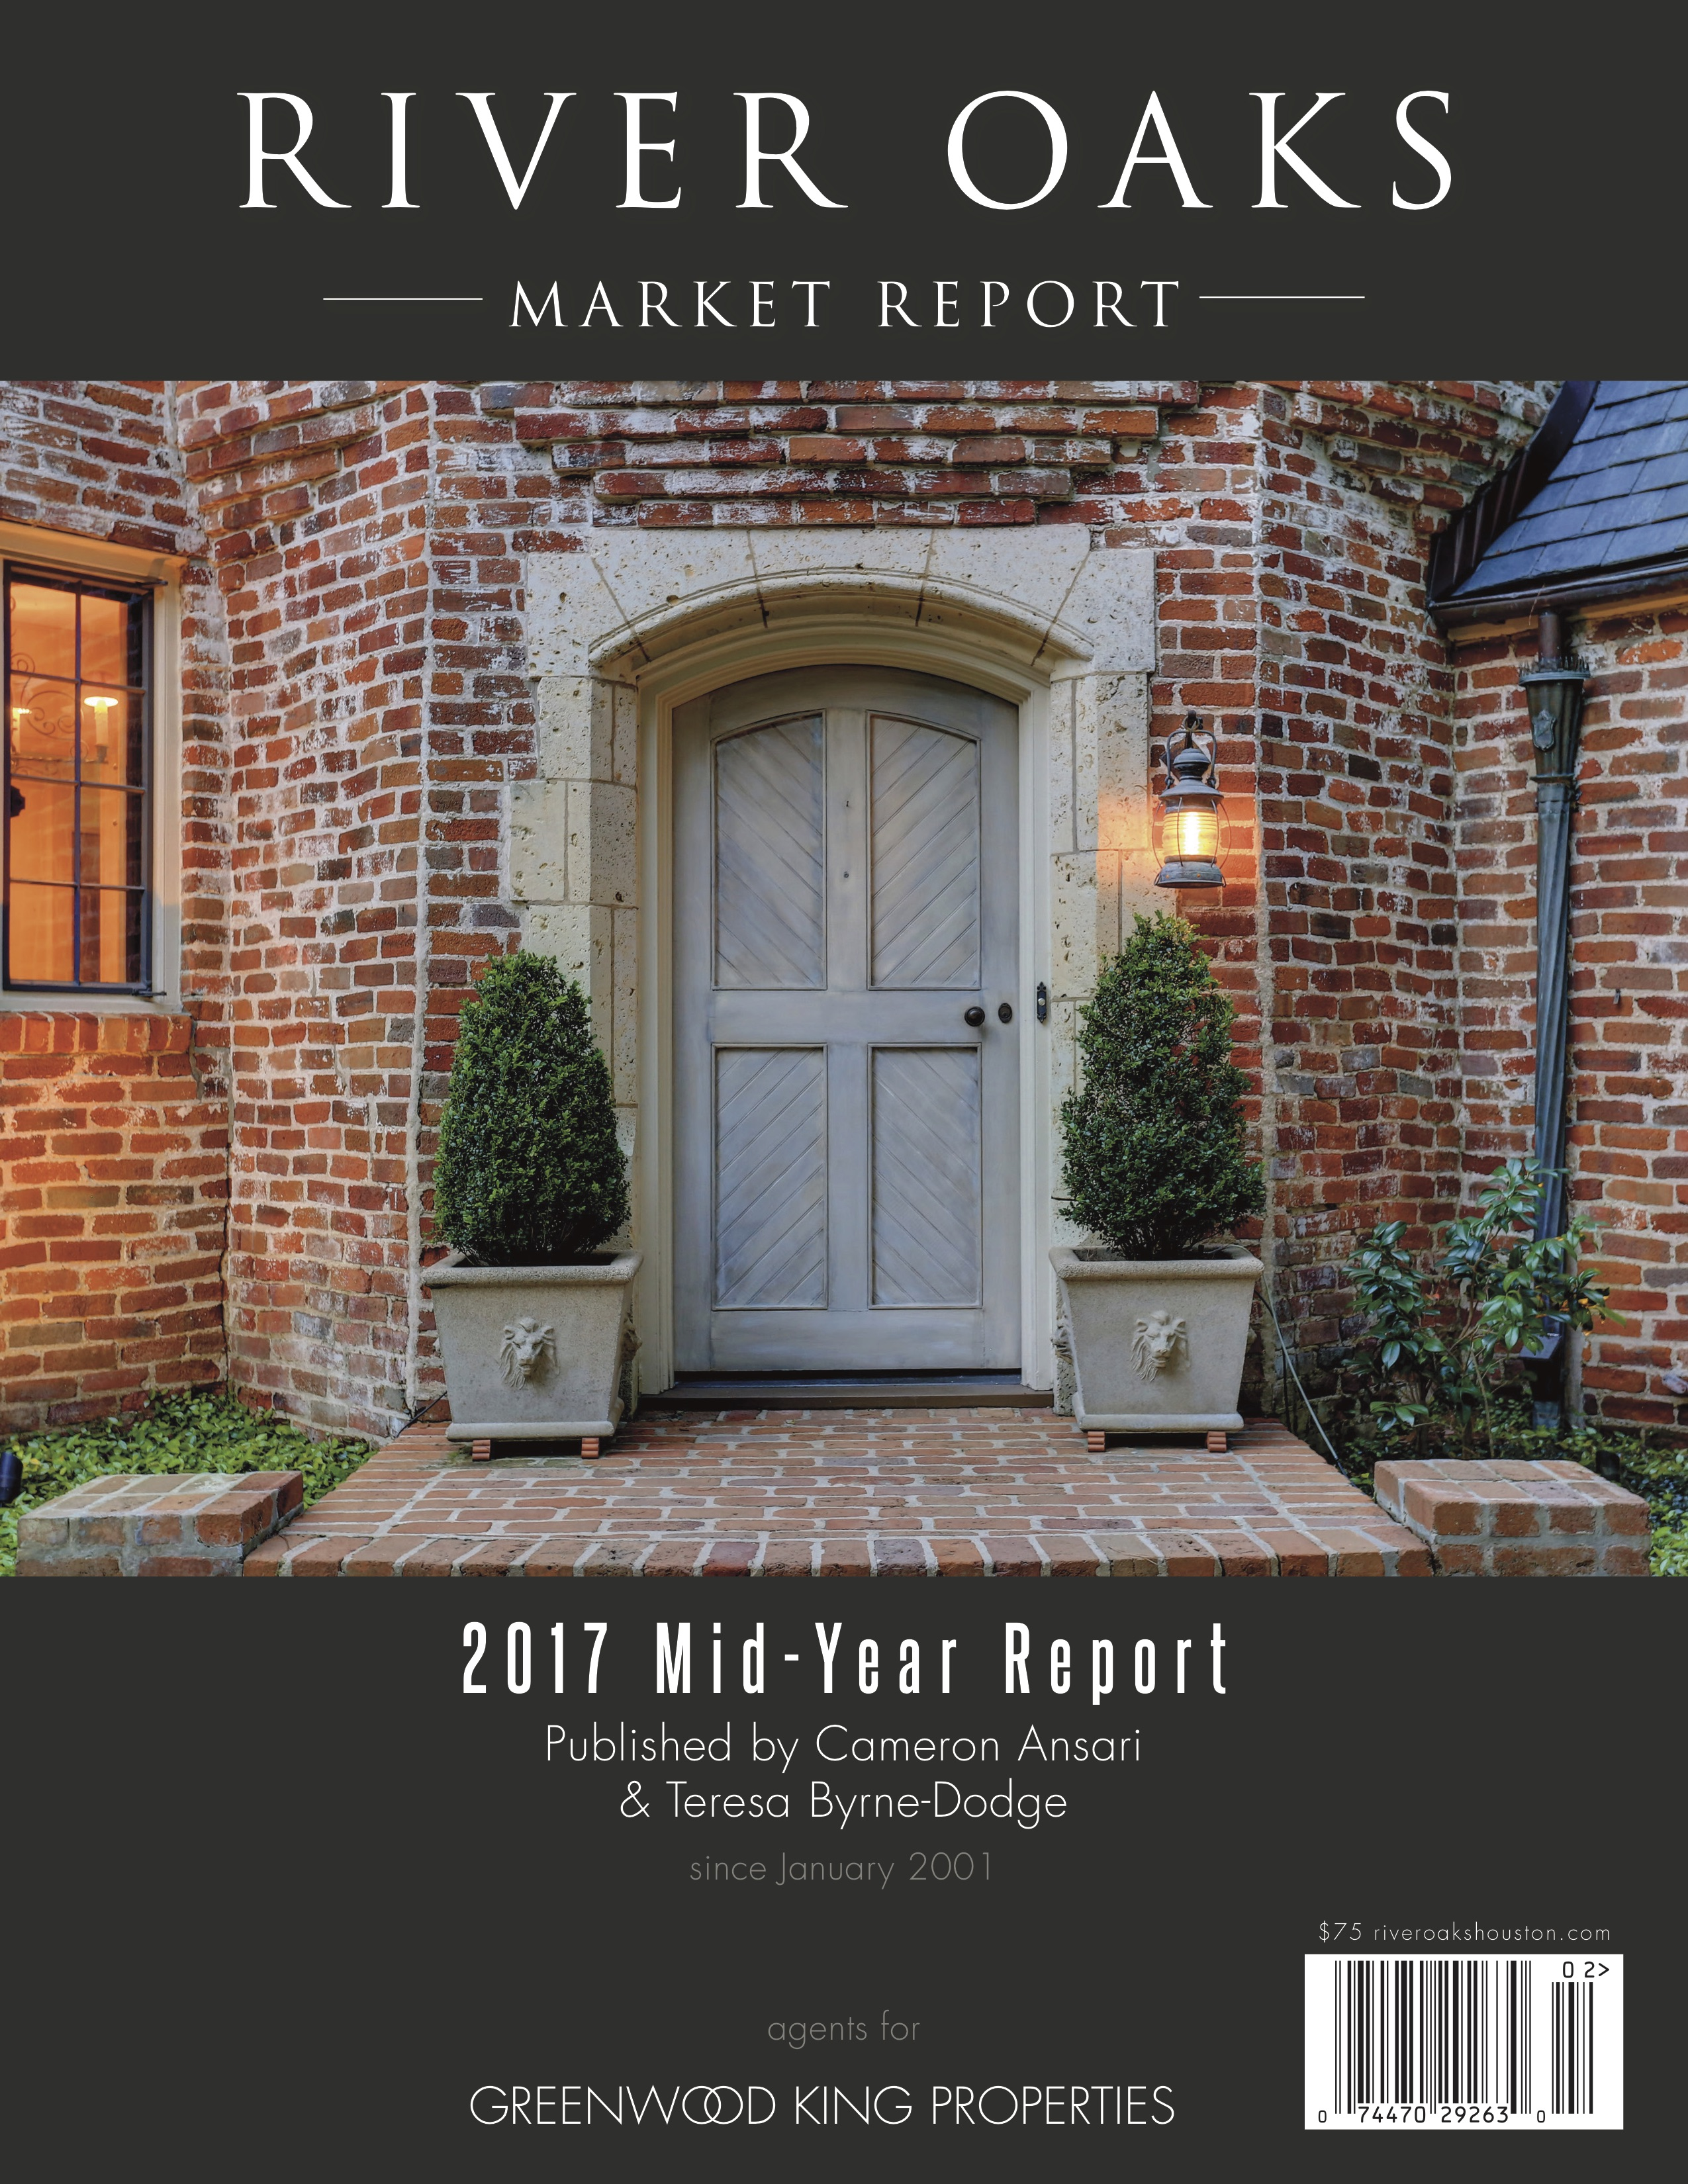 River Oaks Market Report 2017 Outlook (cover)